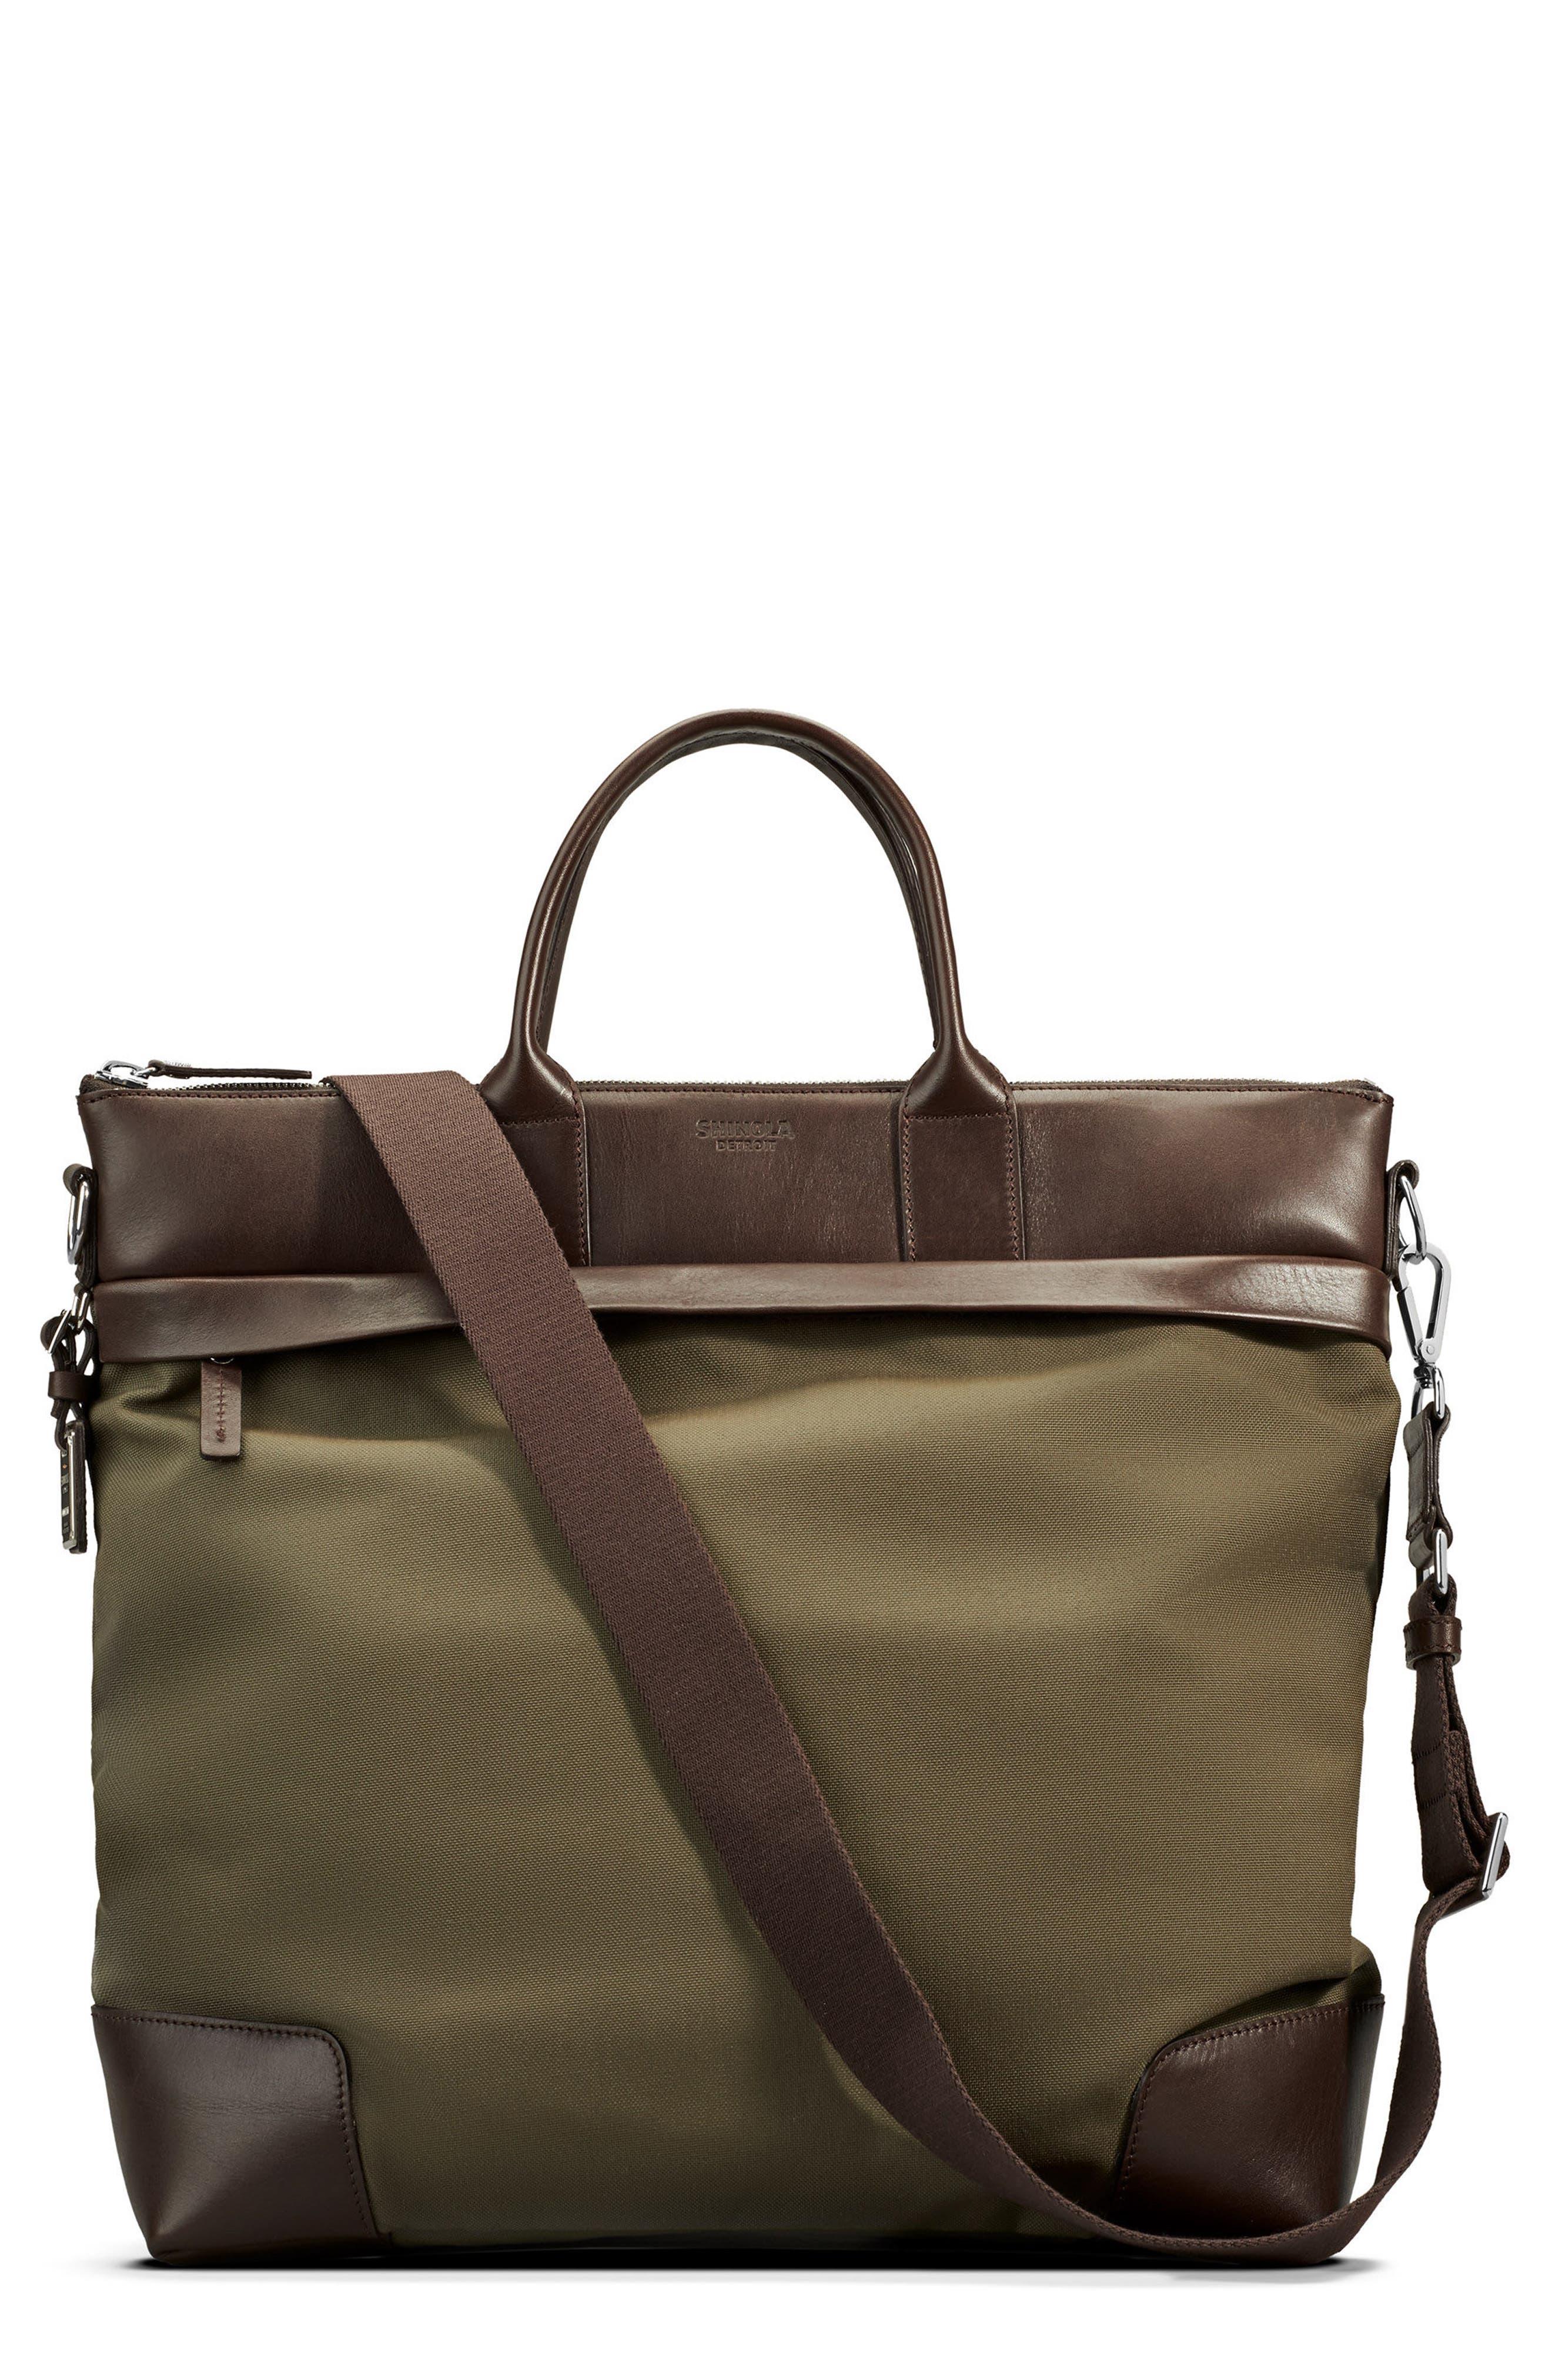 Alternate Image 1 Selected - Shinola Tote Bag